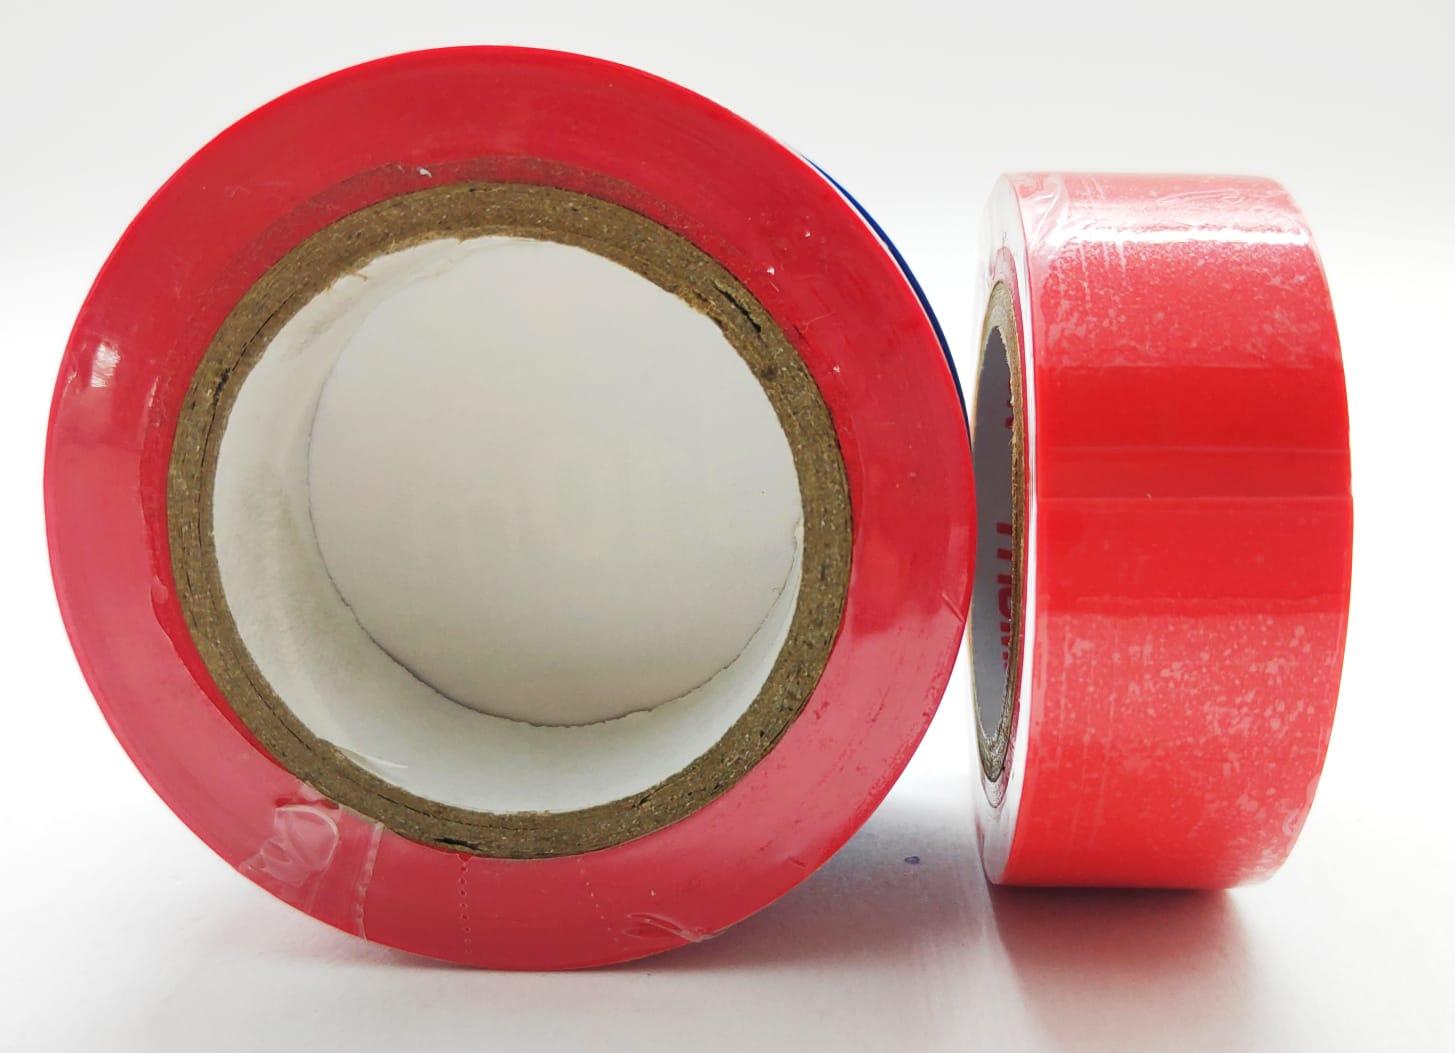 Fita Isolante Vermelha 19mm X 10M - GMI